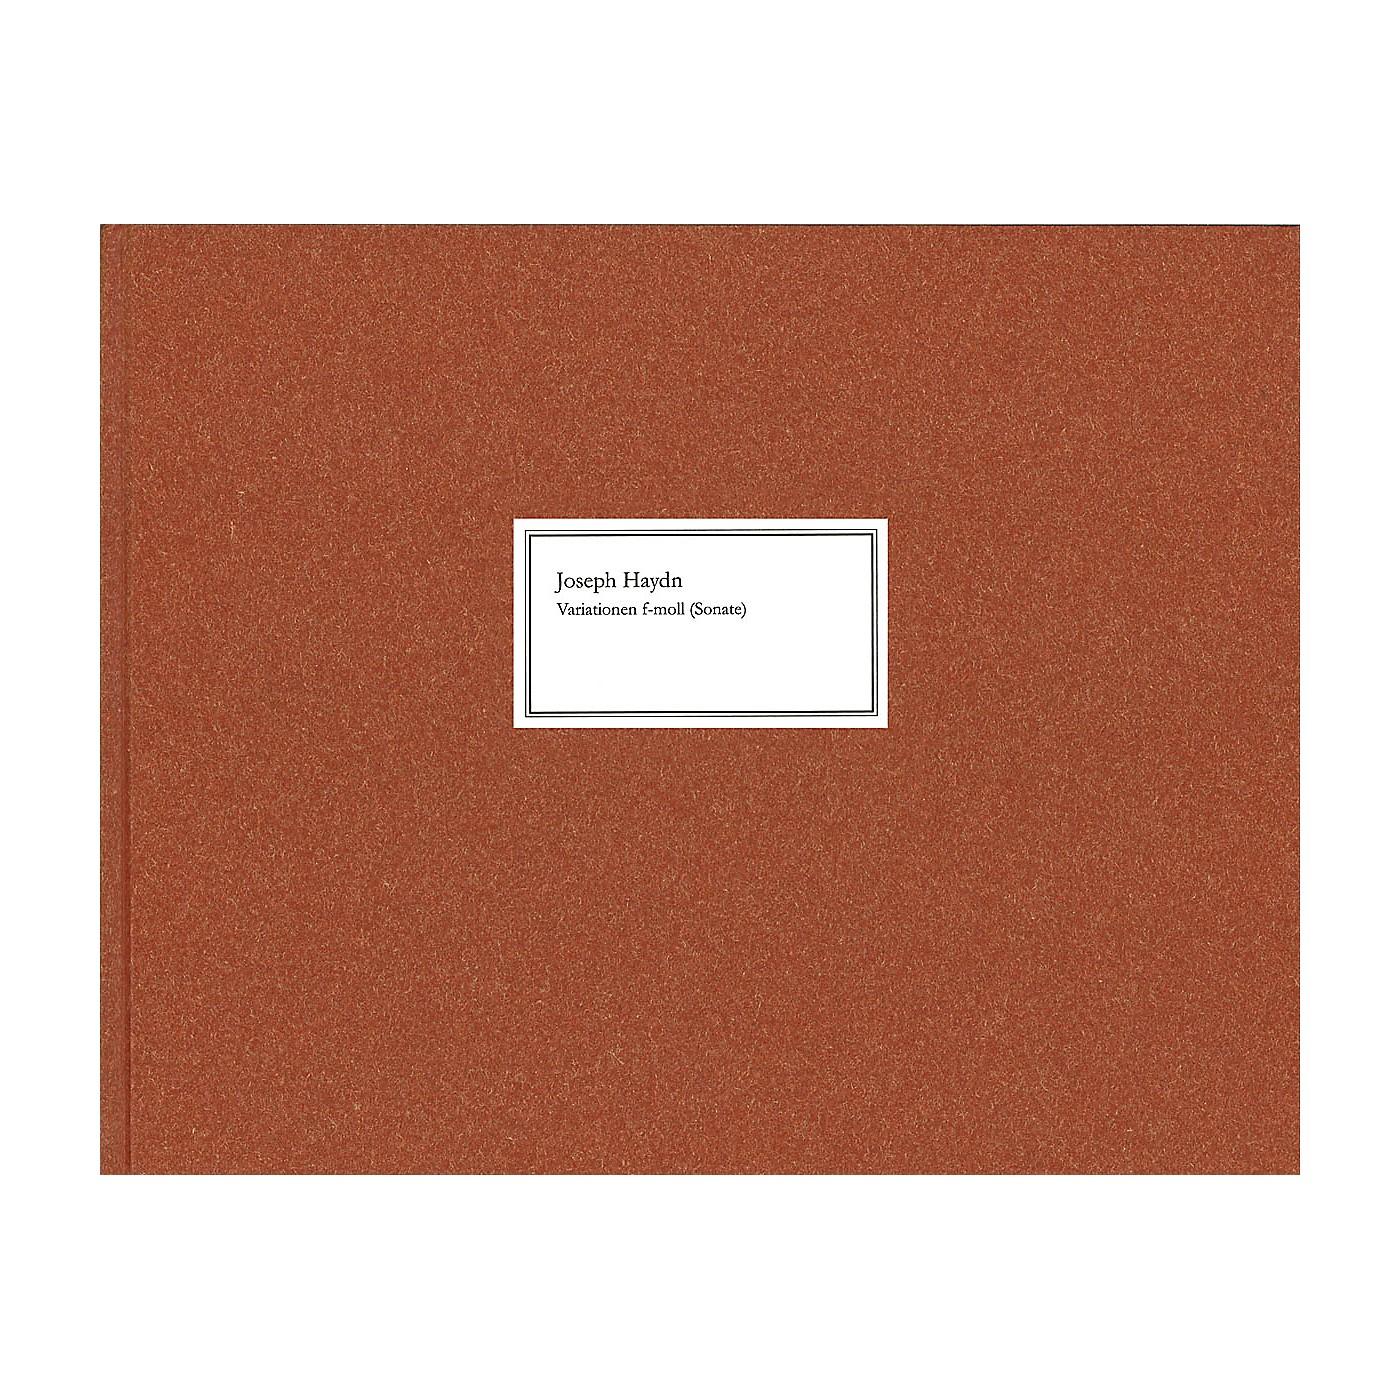 G. Henle Verlag Variations F Minor (Sonata) Hob. xvii: 6 Henle Complete Edition Series Hardcover by Franz Josef Haydn thumbnail